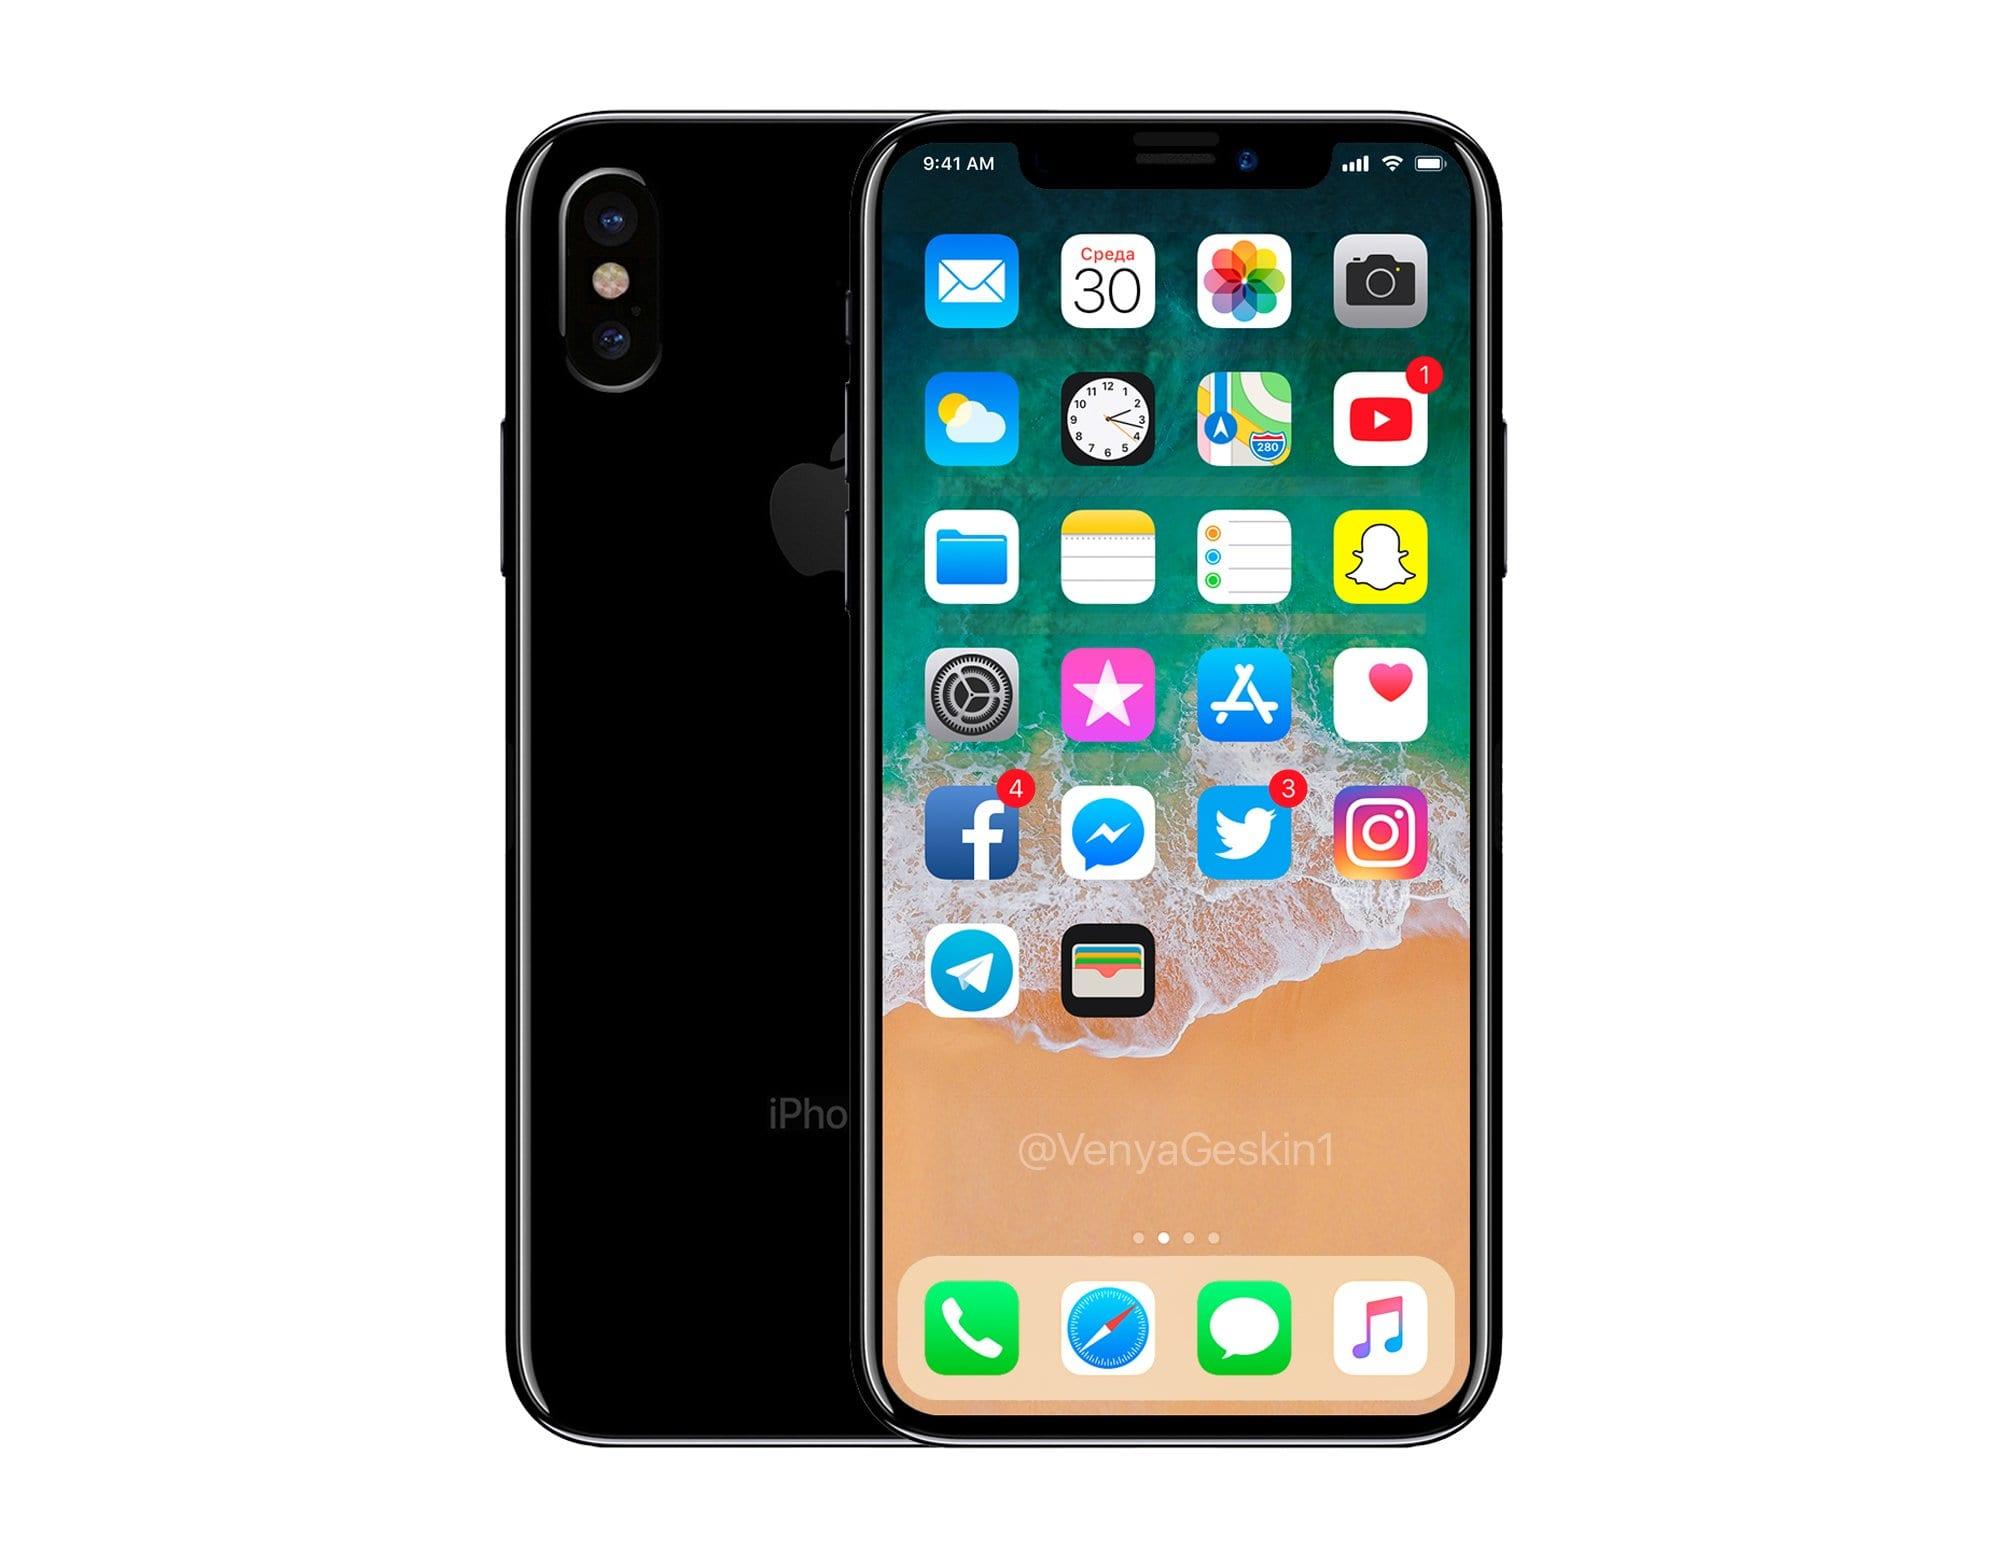 iphone 8 dock mockup